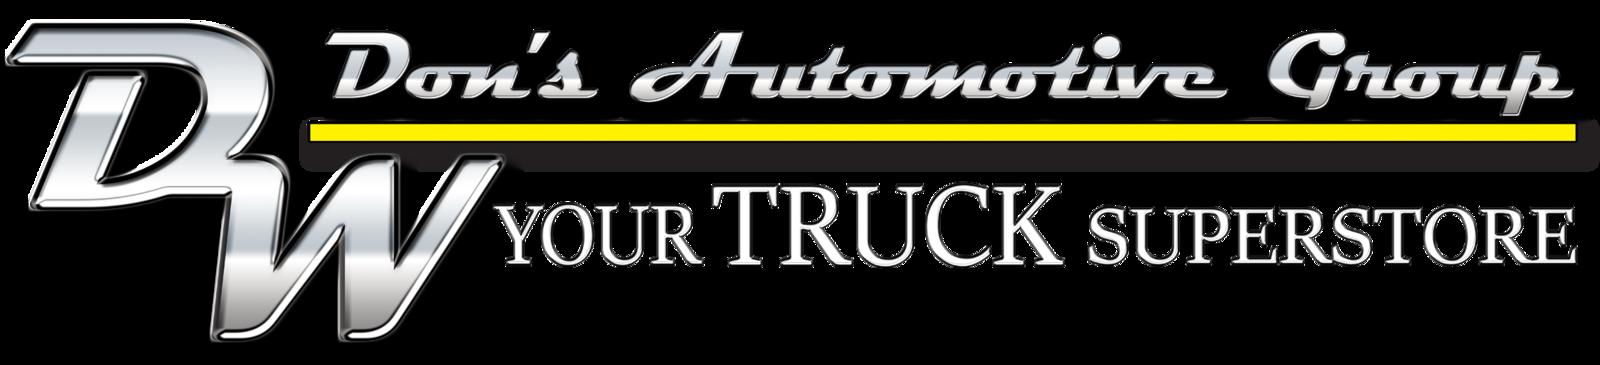 Infiniti Of Baton Rouge >> Don's Automotive Group Broussard - Broussard, LA: Read ...